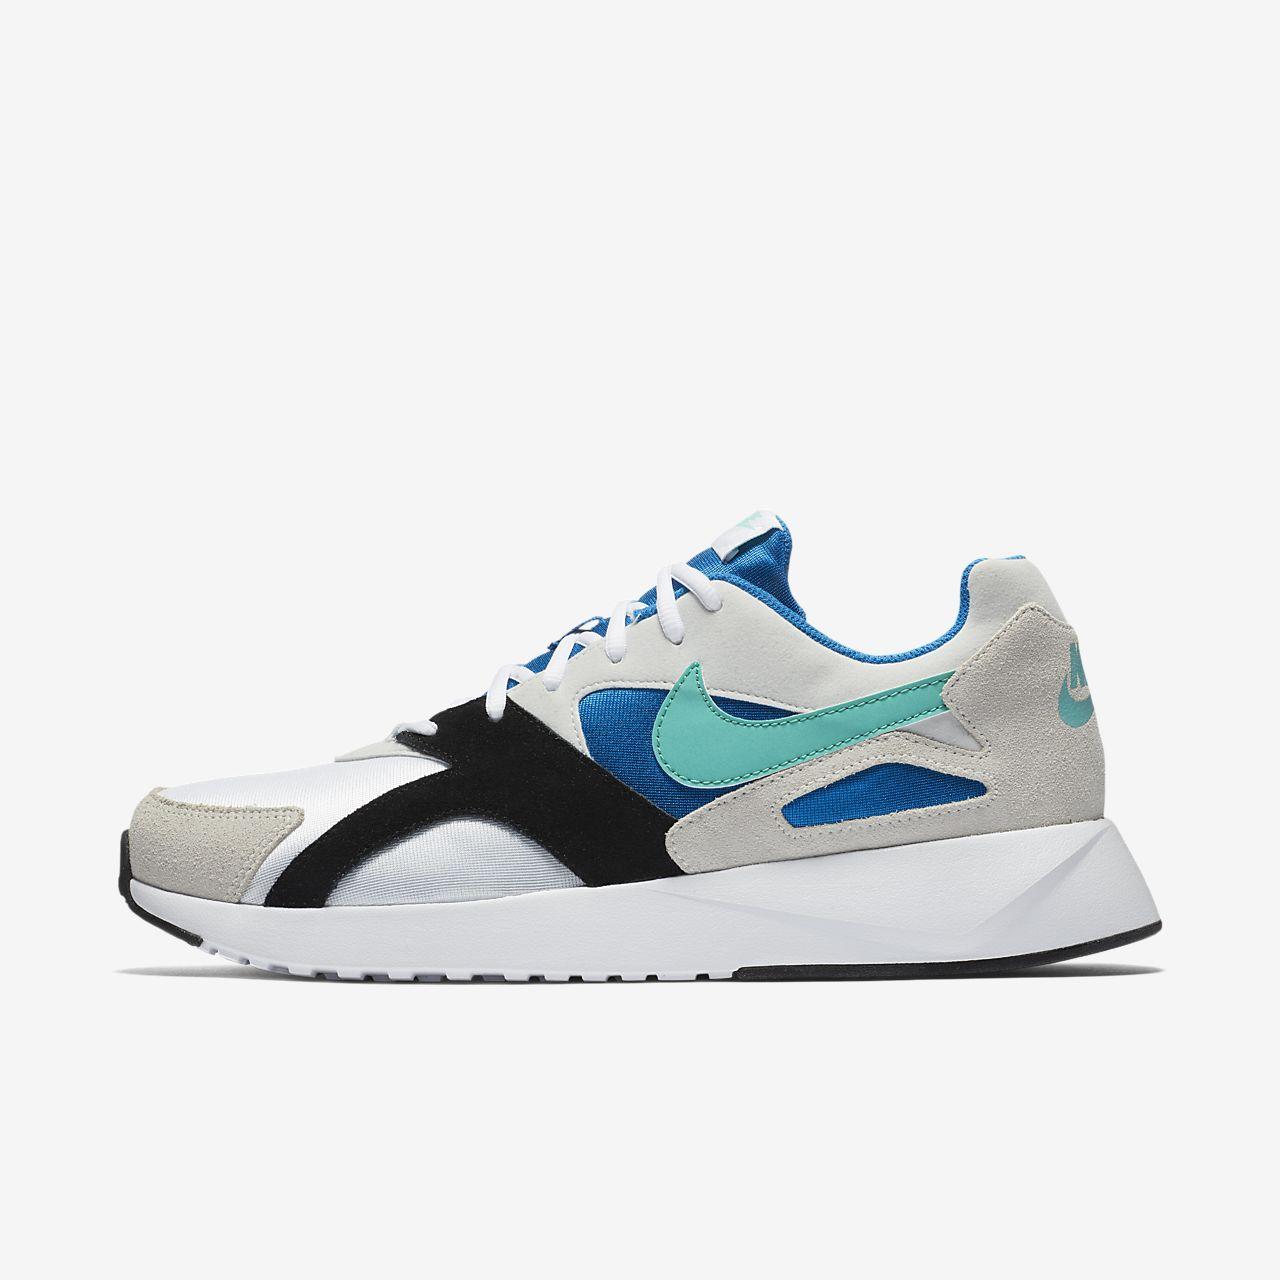 Nike Chaussures Pantheos Blanc qb4ubeqFp